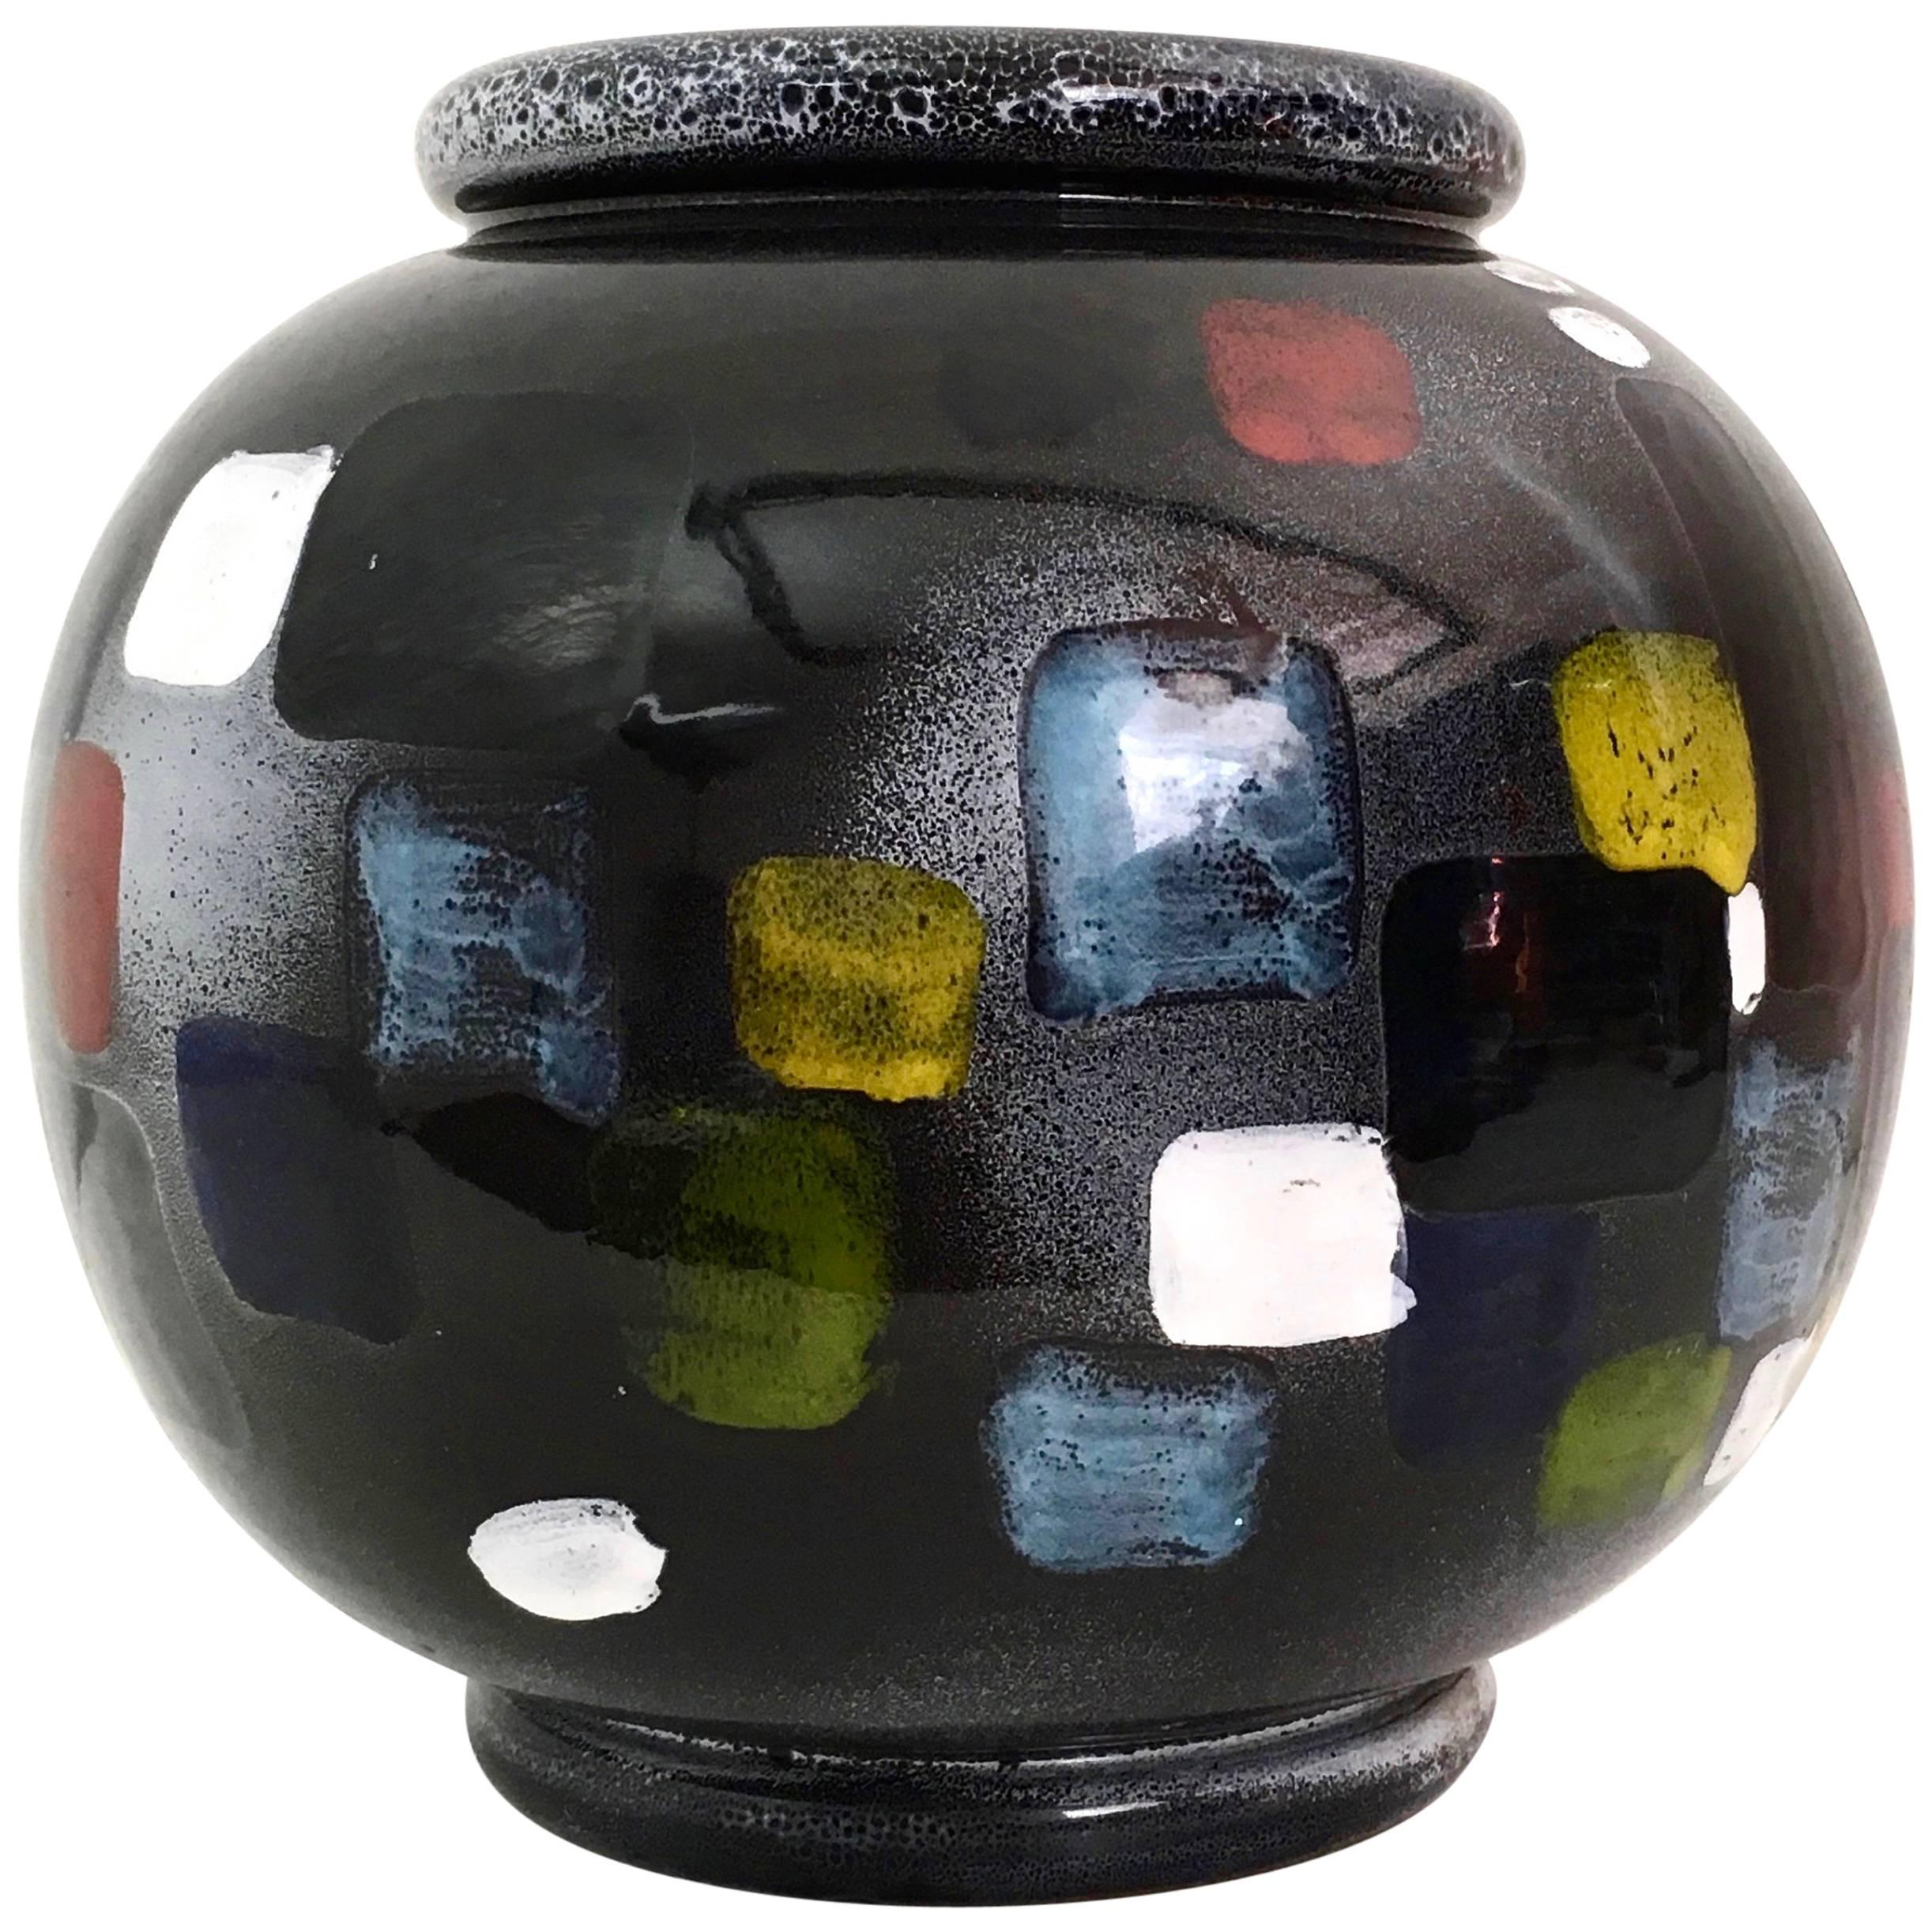 Vintage Black Deruta Ceramic Vase, Italy, 1960s-1970s